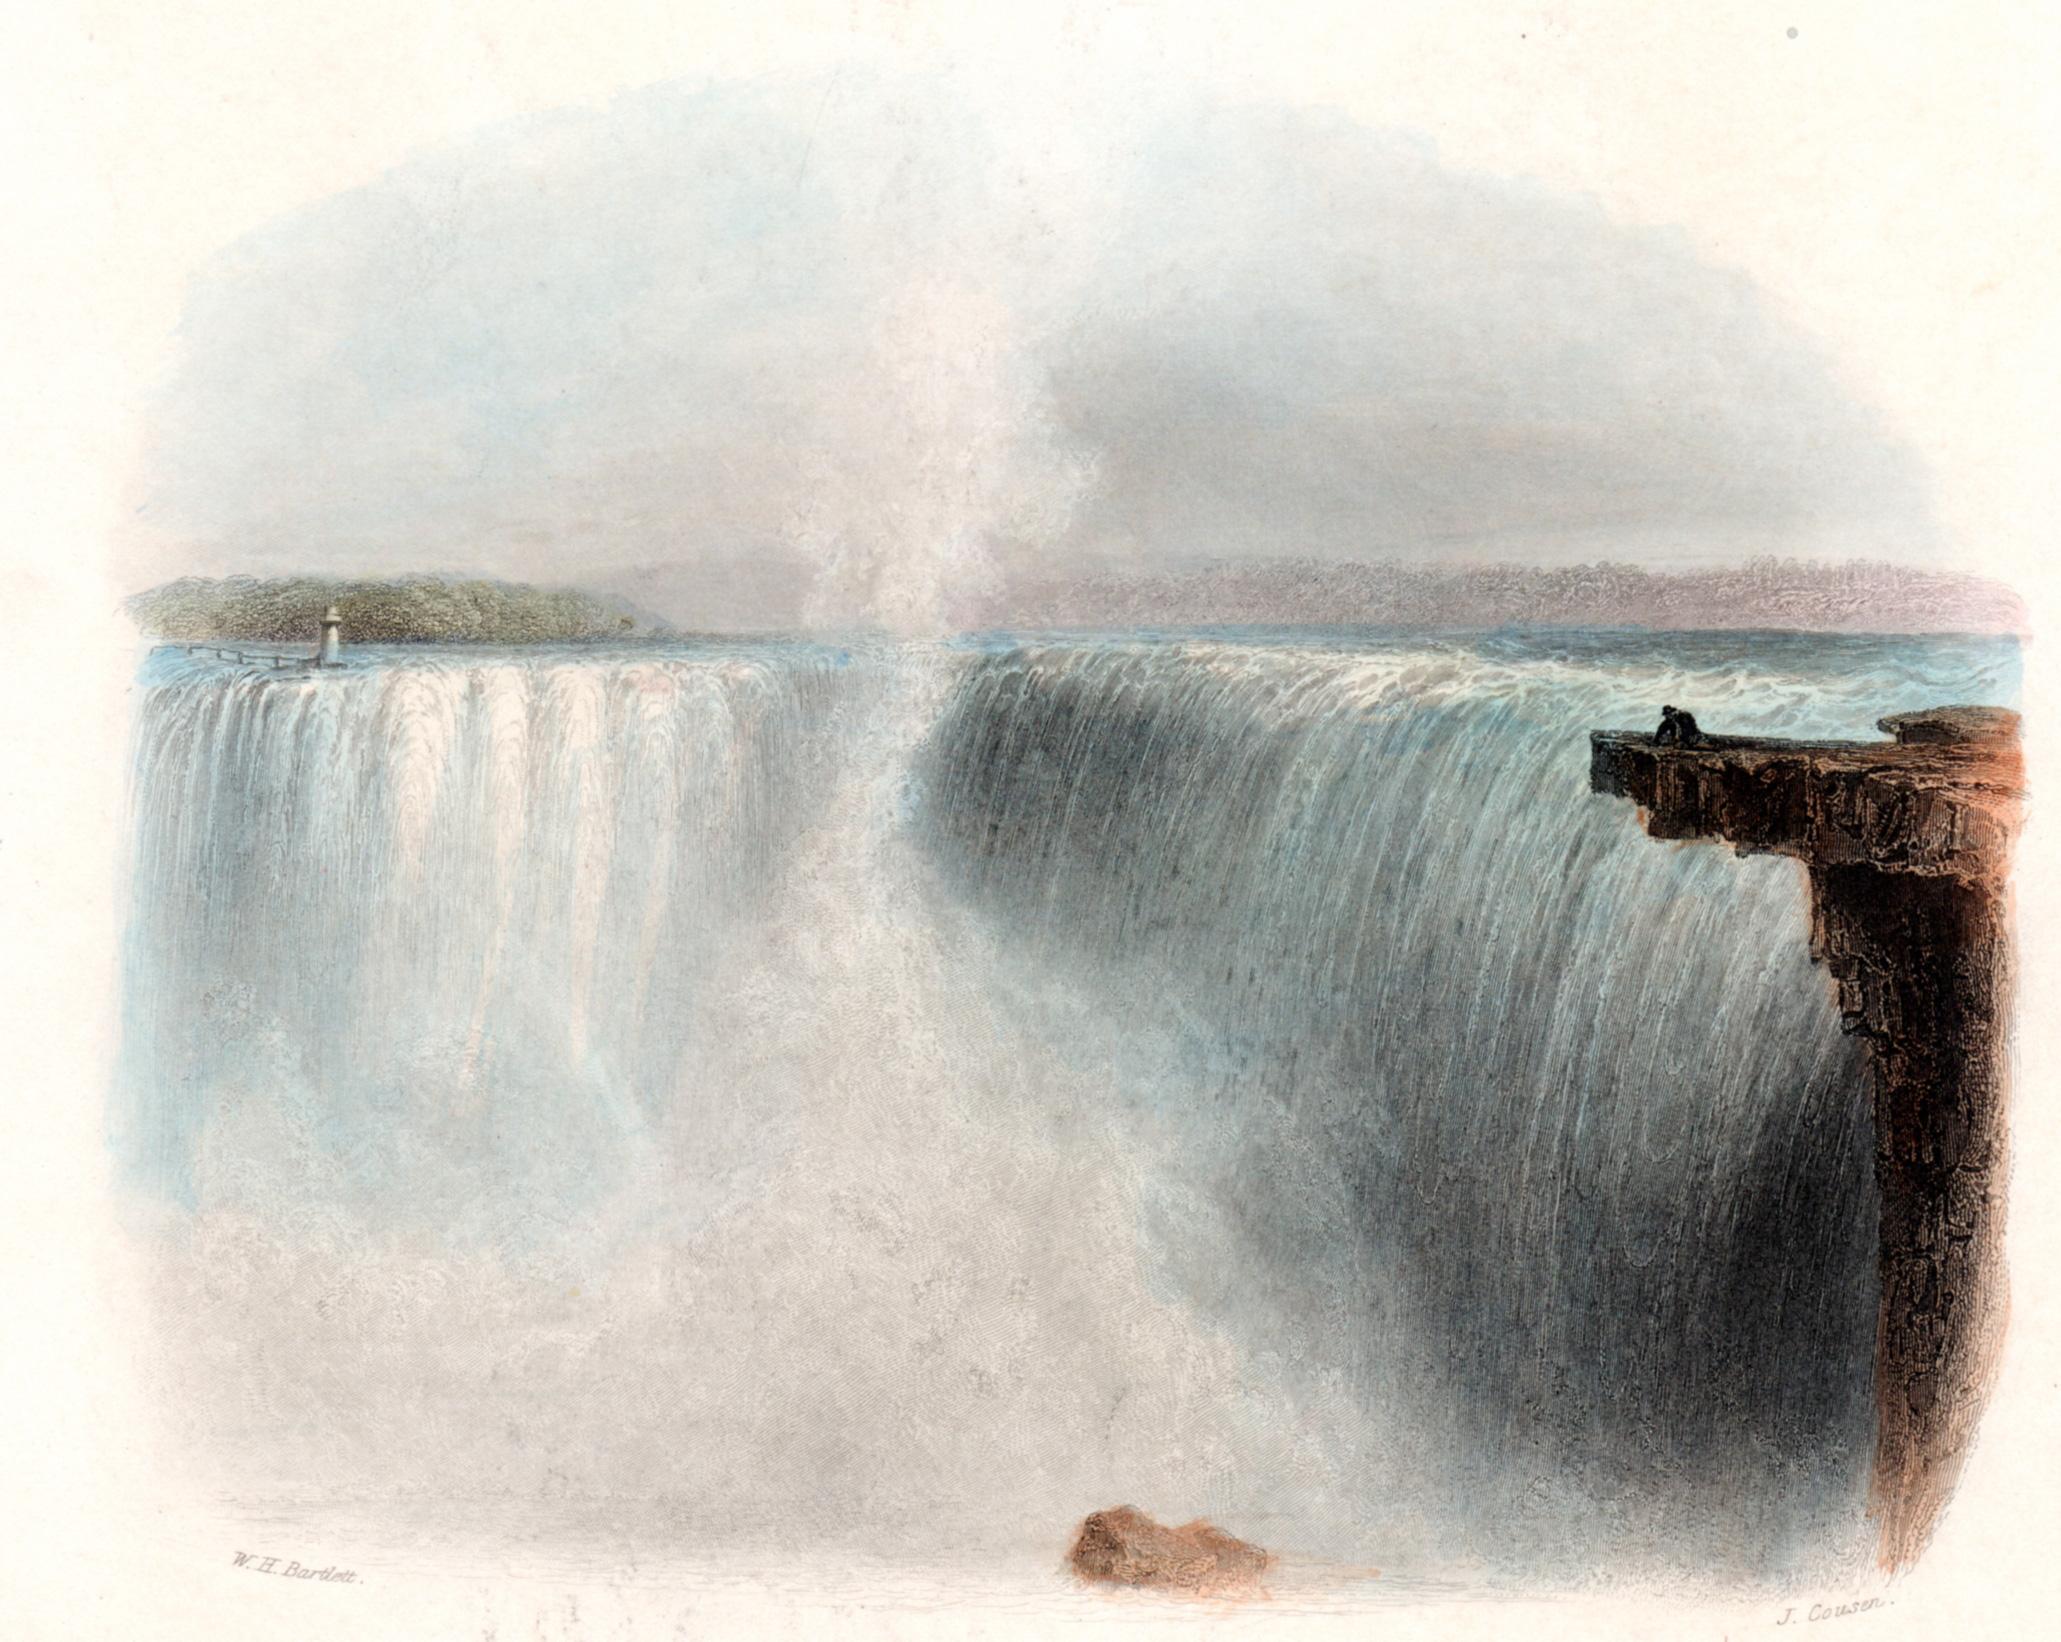 Allom, Thomas / Bartlett, Wm Henry –Canadian Scenery